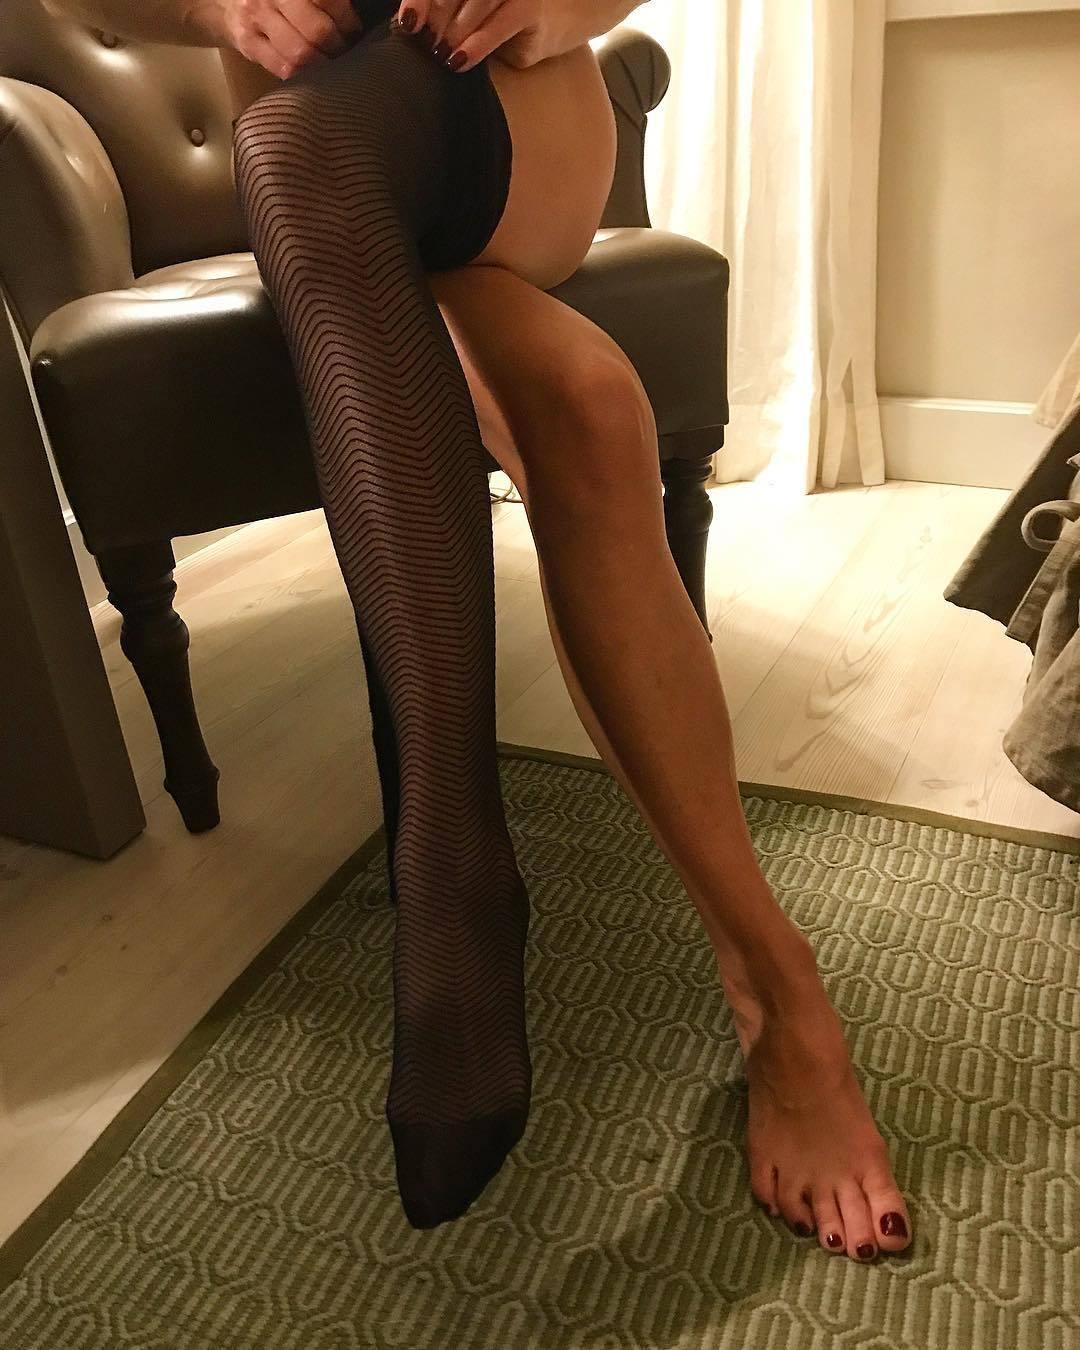 Hot Feet Caroline CLN naked photo 2017